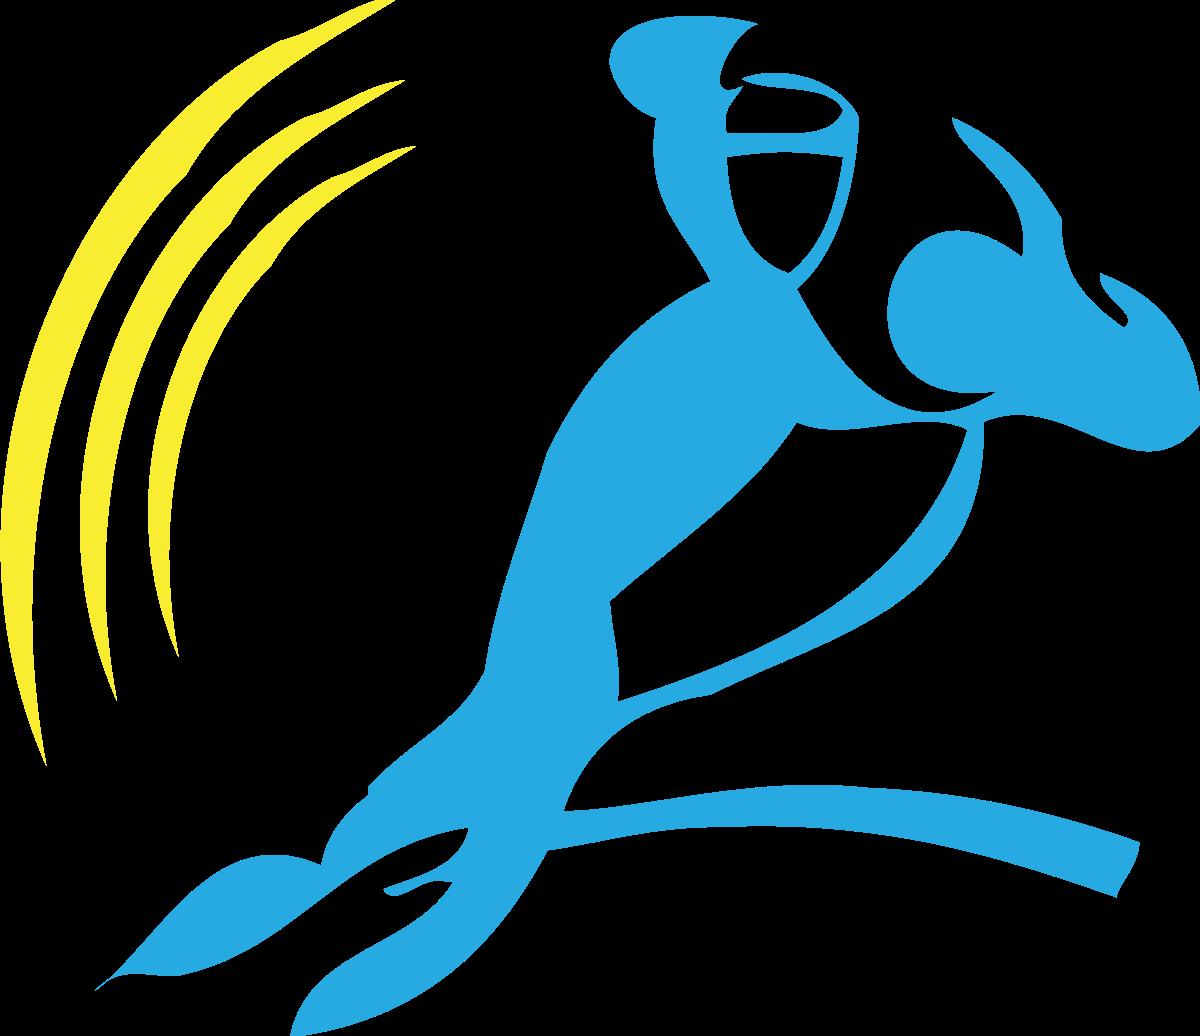 Cross country skis clipart image free National Skating Federation (Kazakhstan) - Wikipedia image free